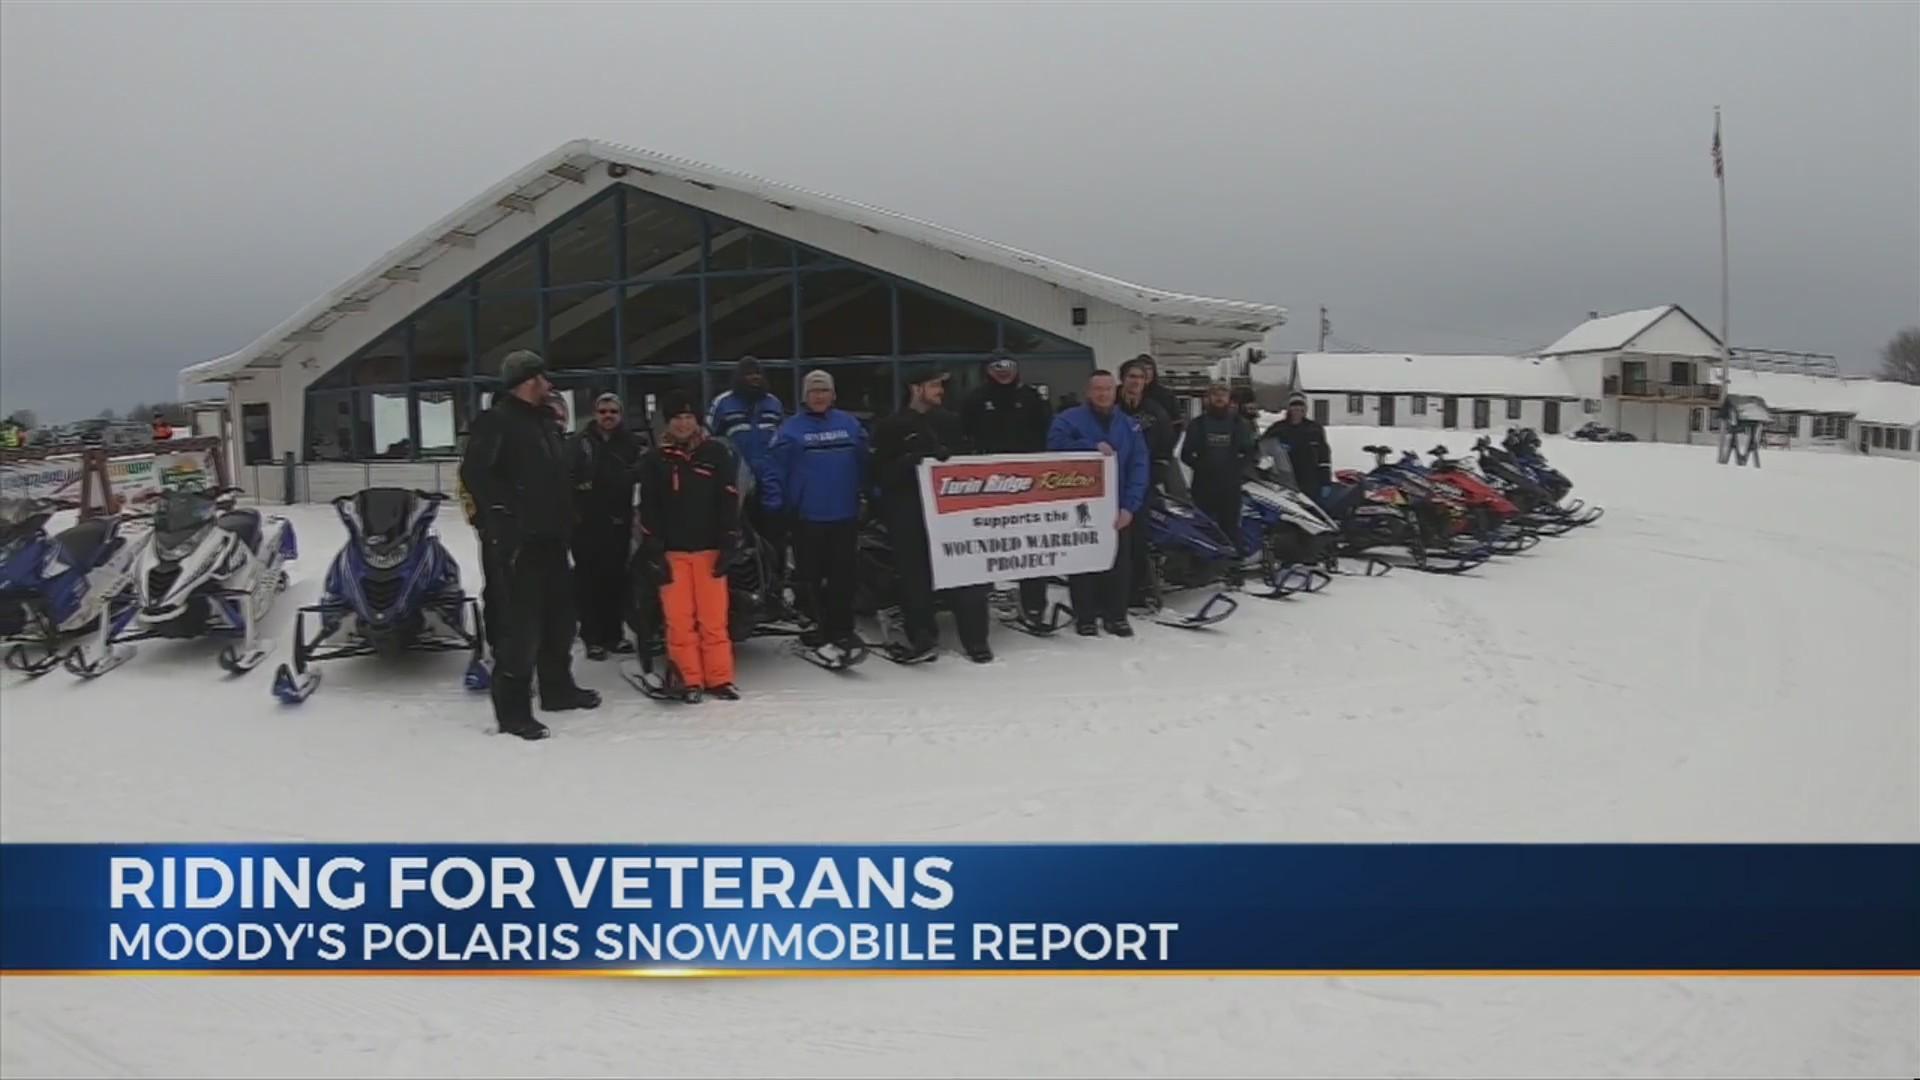 Moody's Polaris Snowmobile Report 2-28